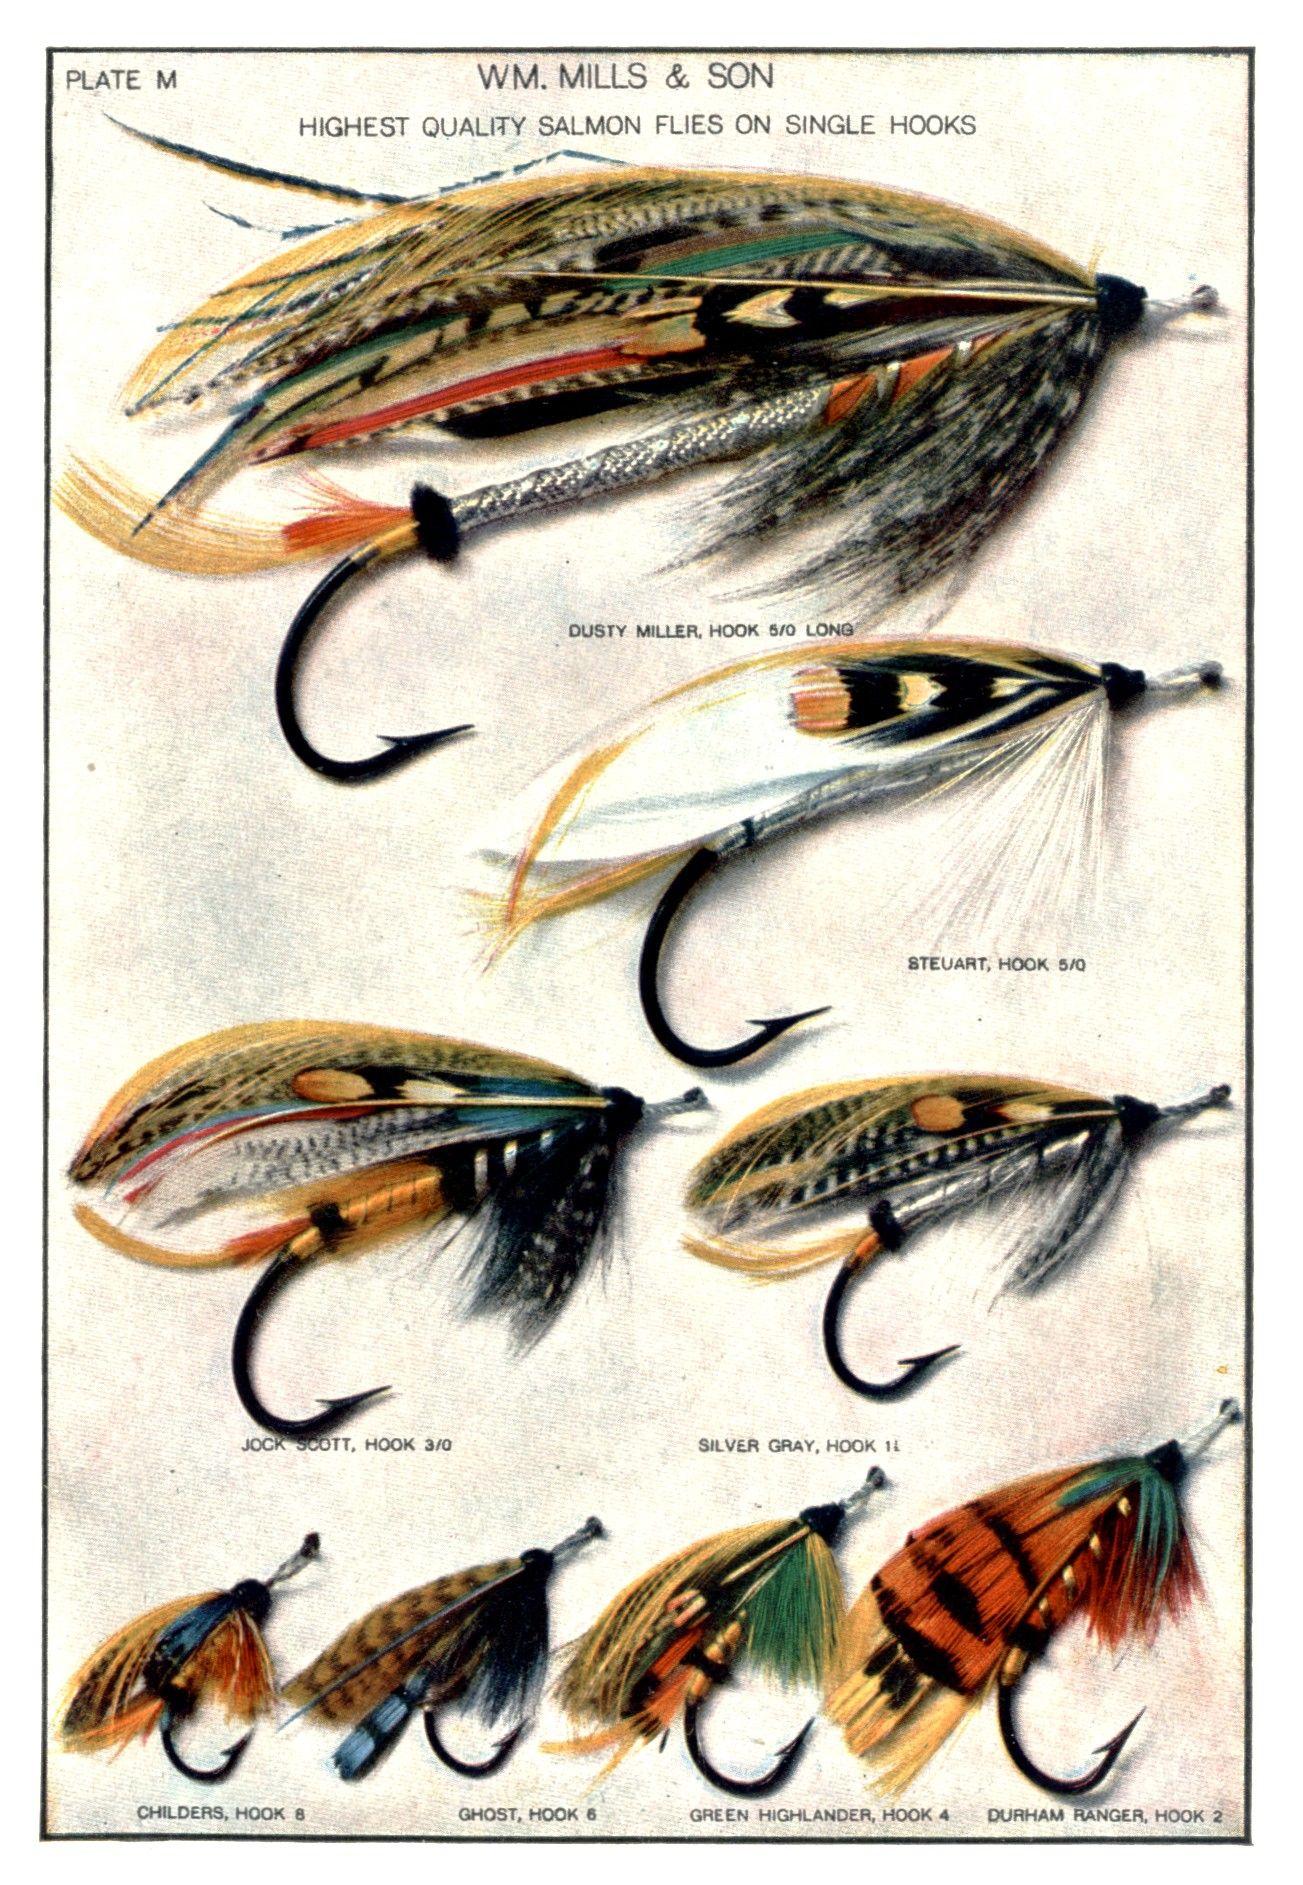 Salmon Flies Fly Fishing Flies Pattern Fly Fishing Books Fly Fishing